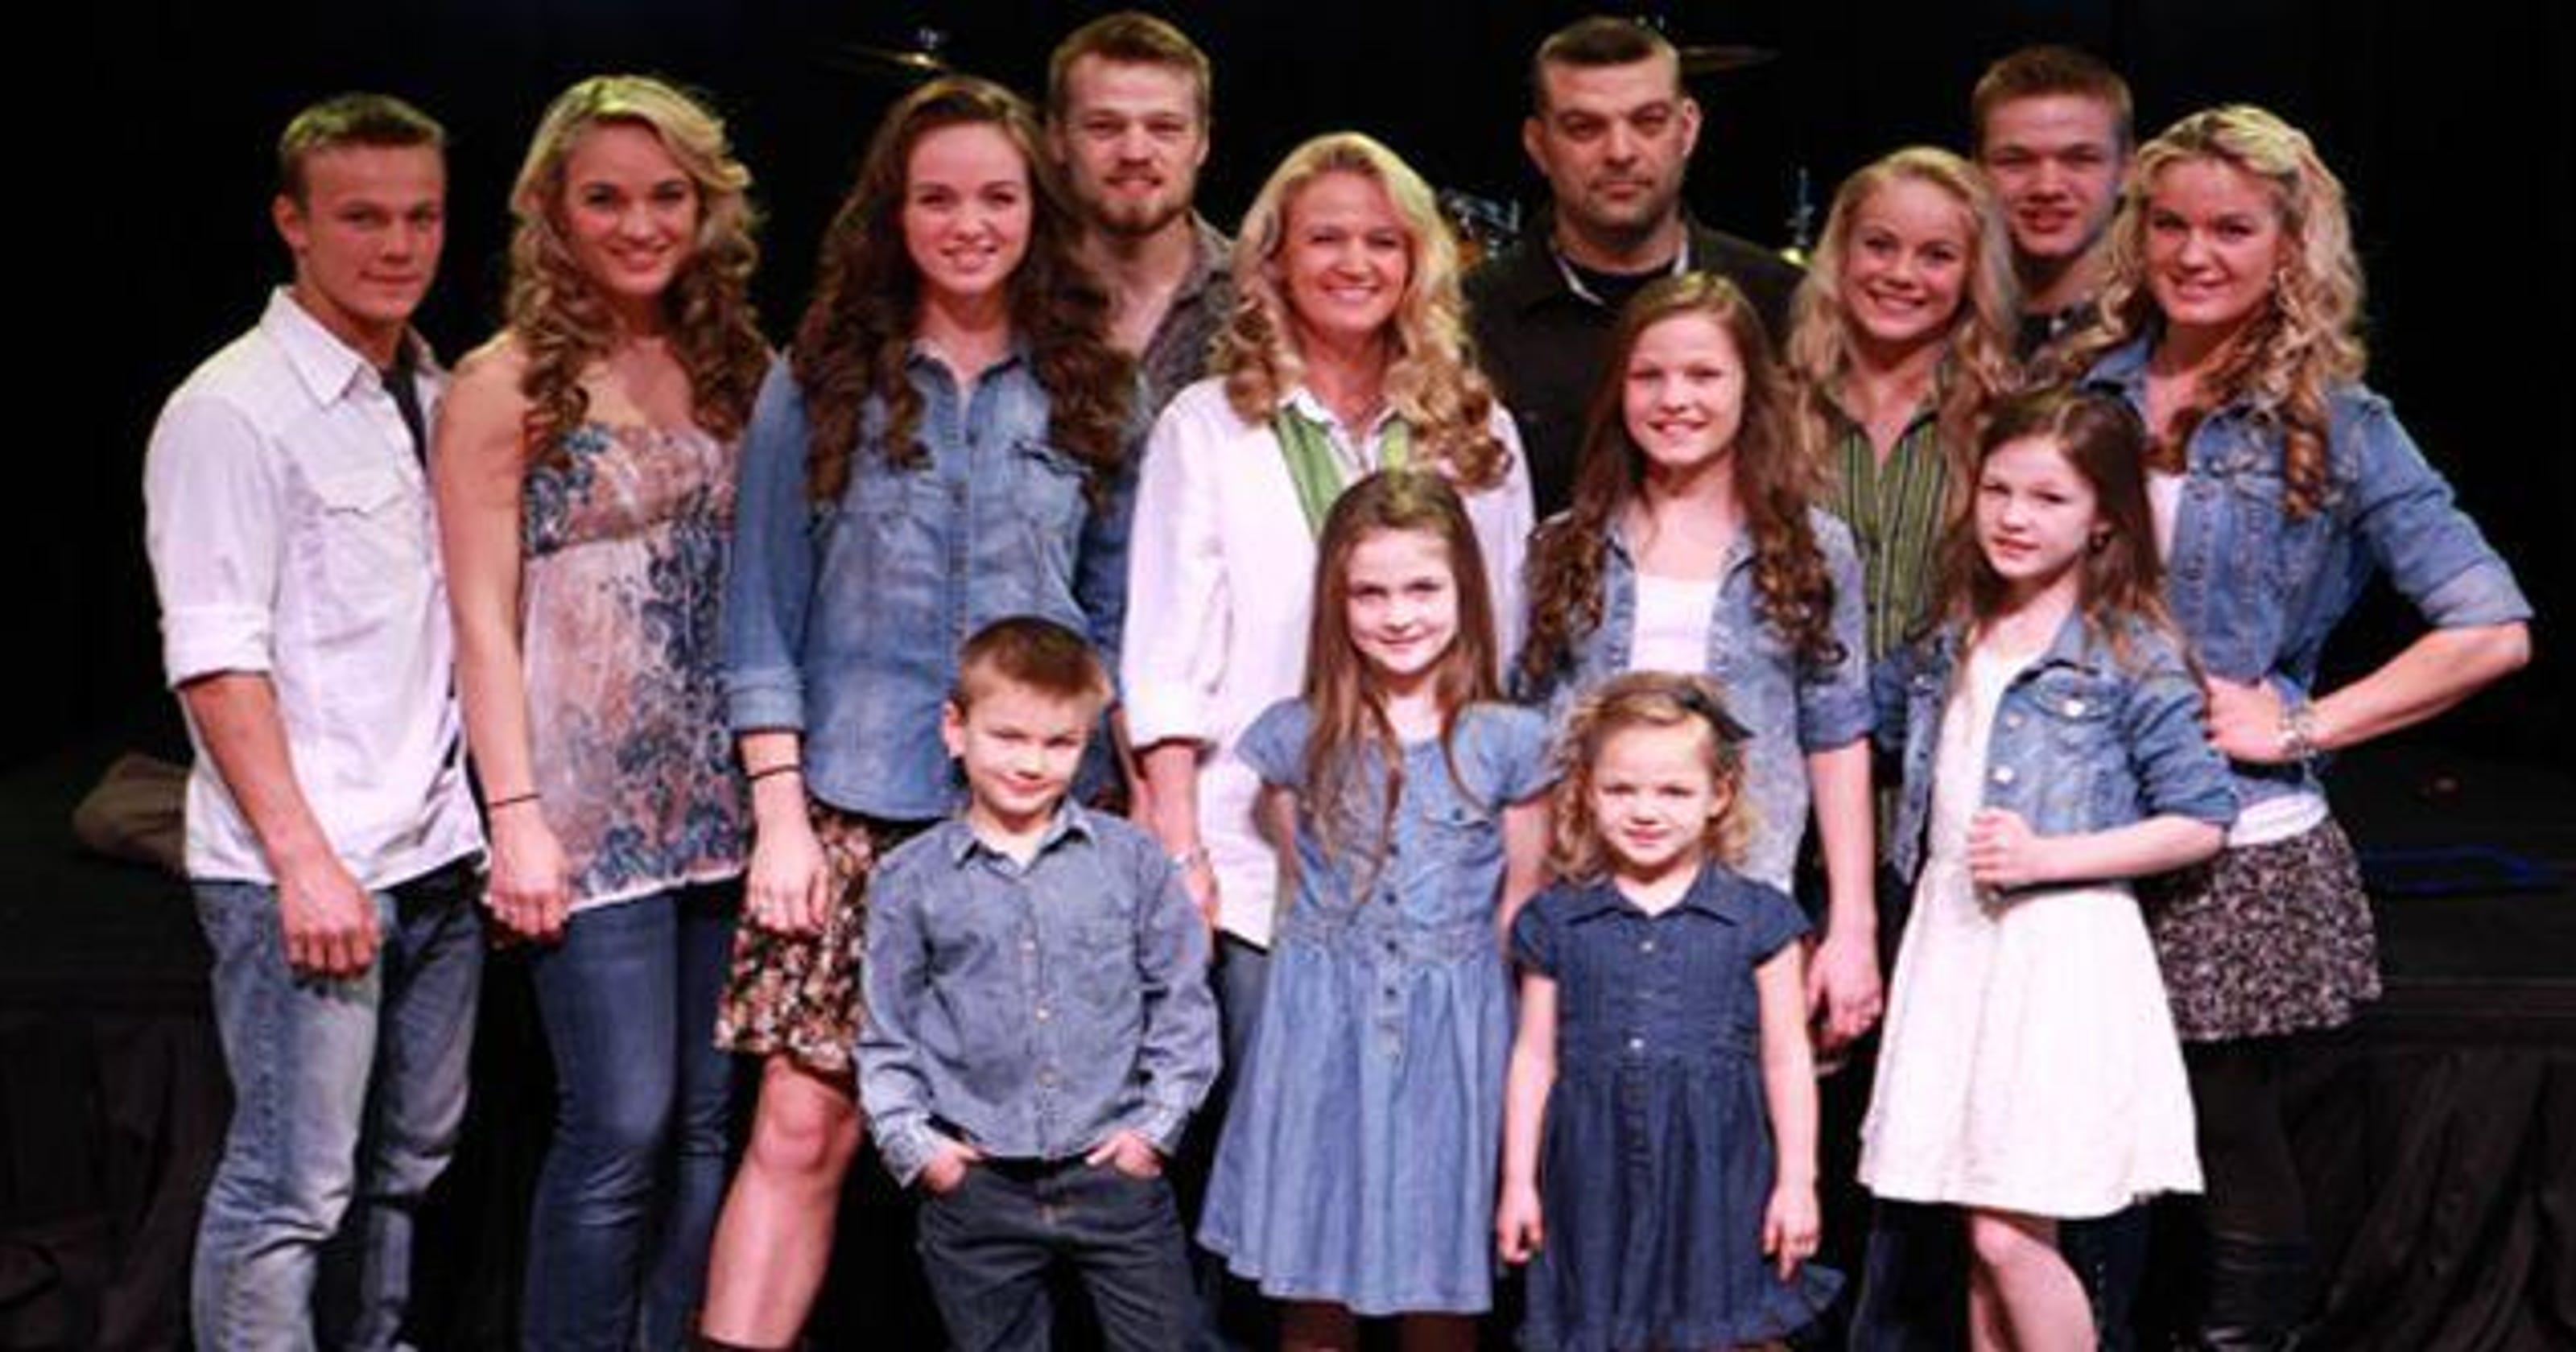 The Willis Family Returns To Tlc